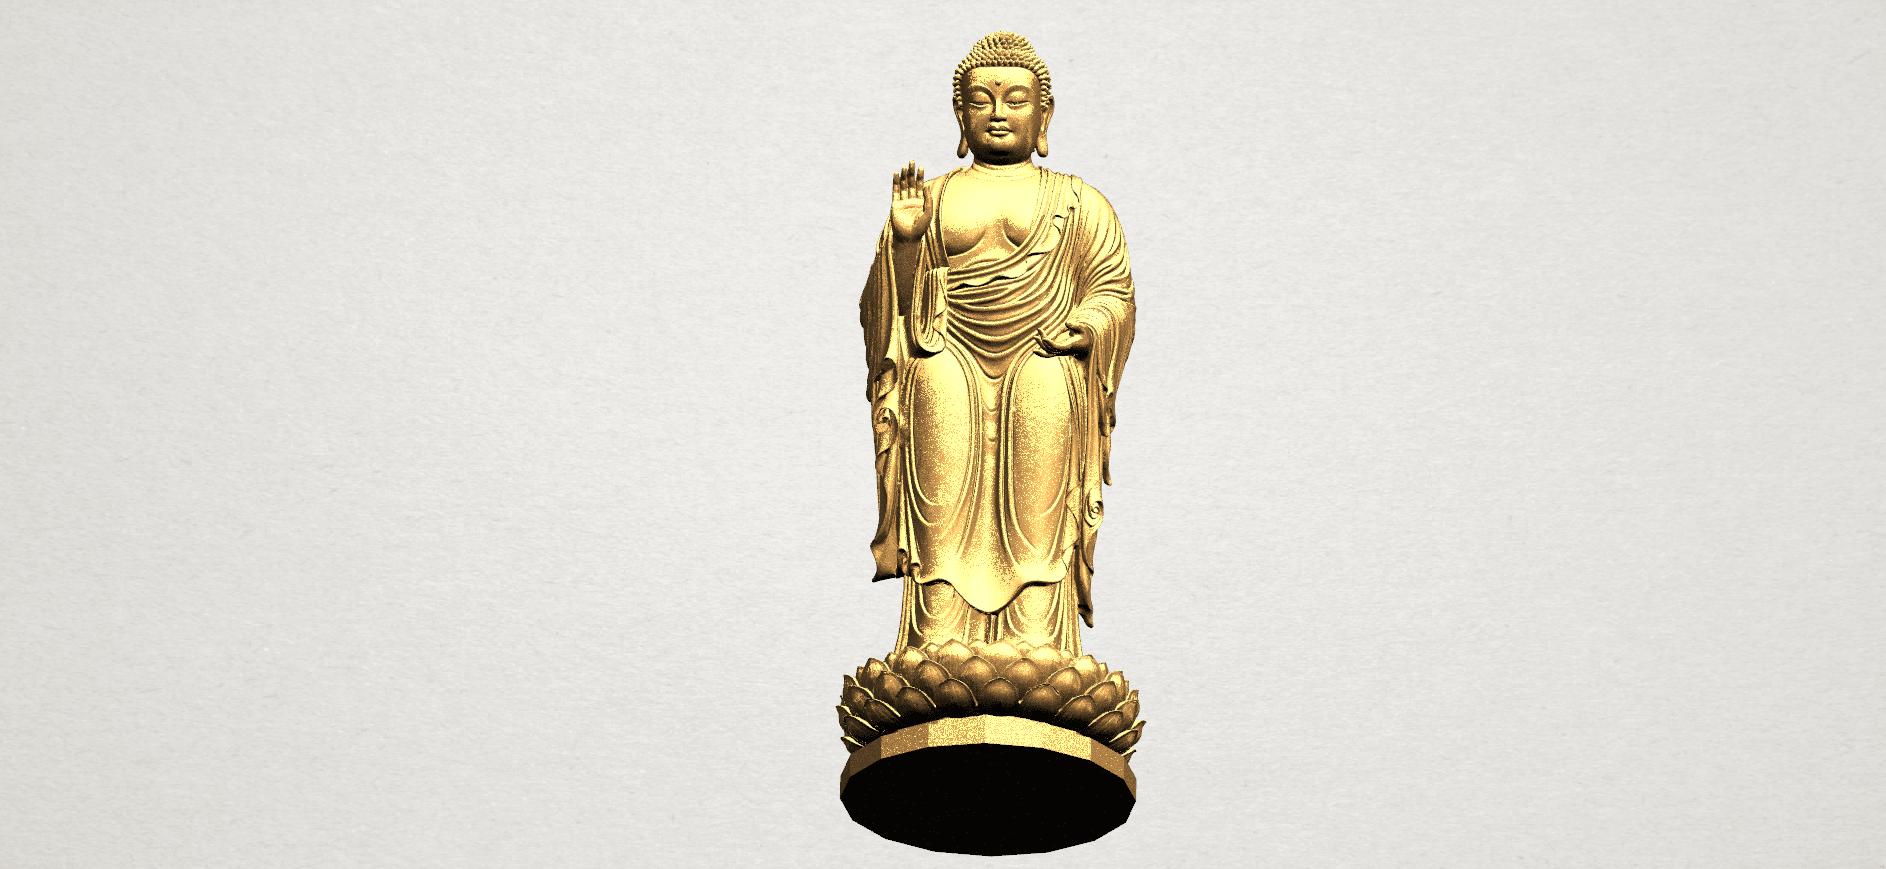 Gautama Buddha Standing (ii) A09.png Download free STL file Gautama Buddha Standing 02 • 3D printer design, GeorgesNikkei